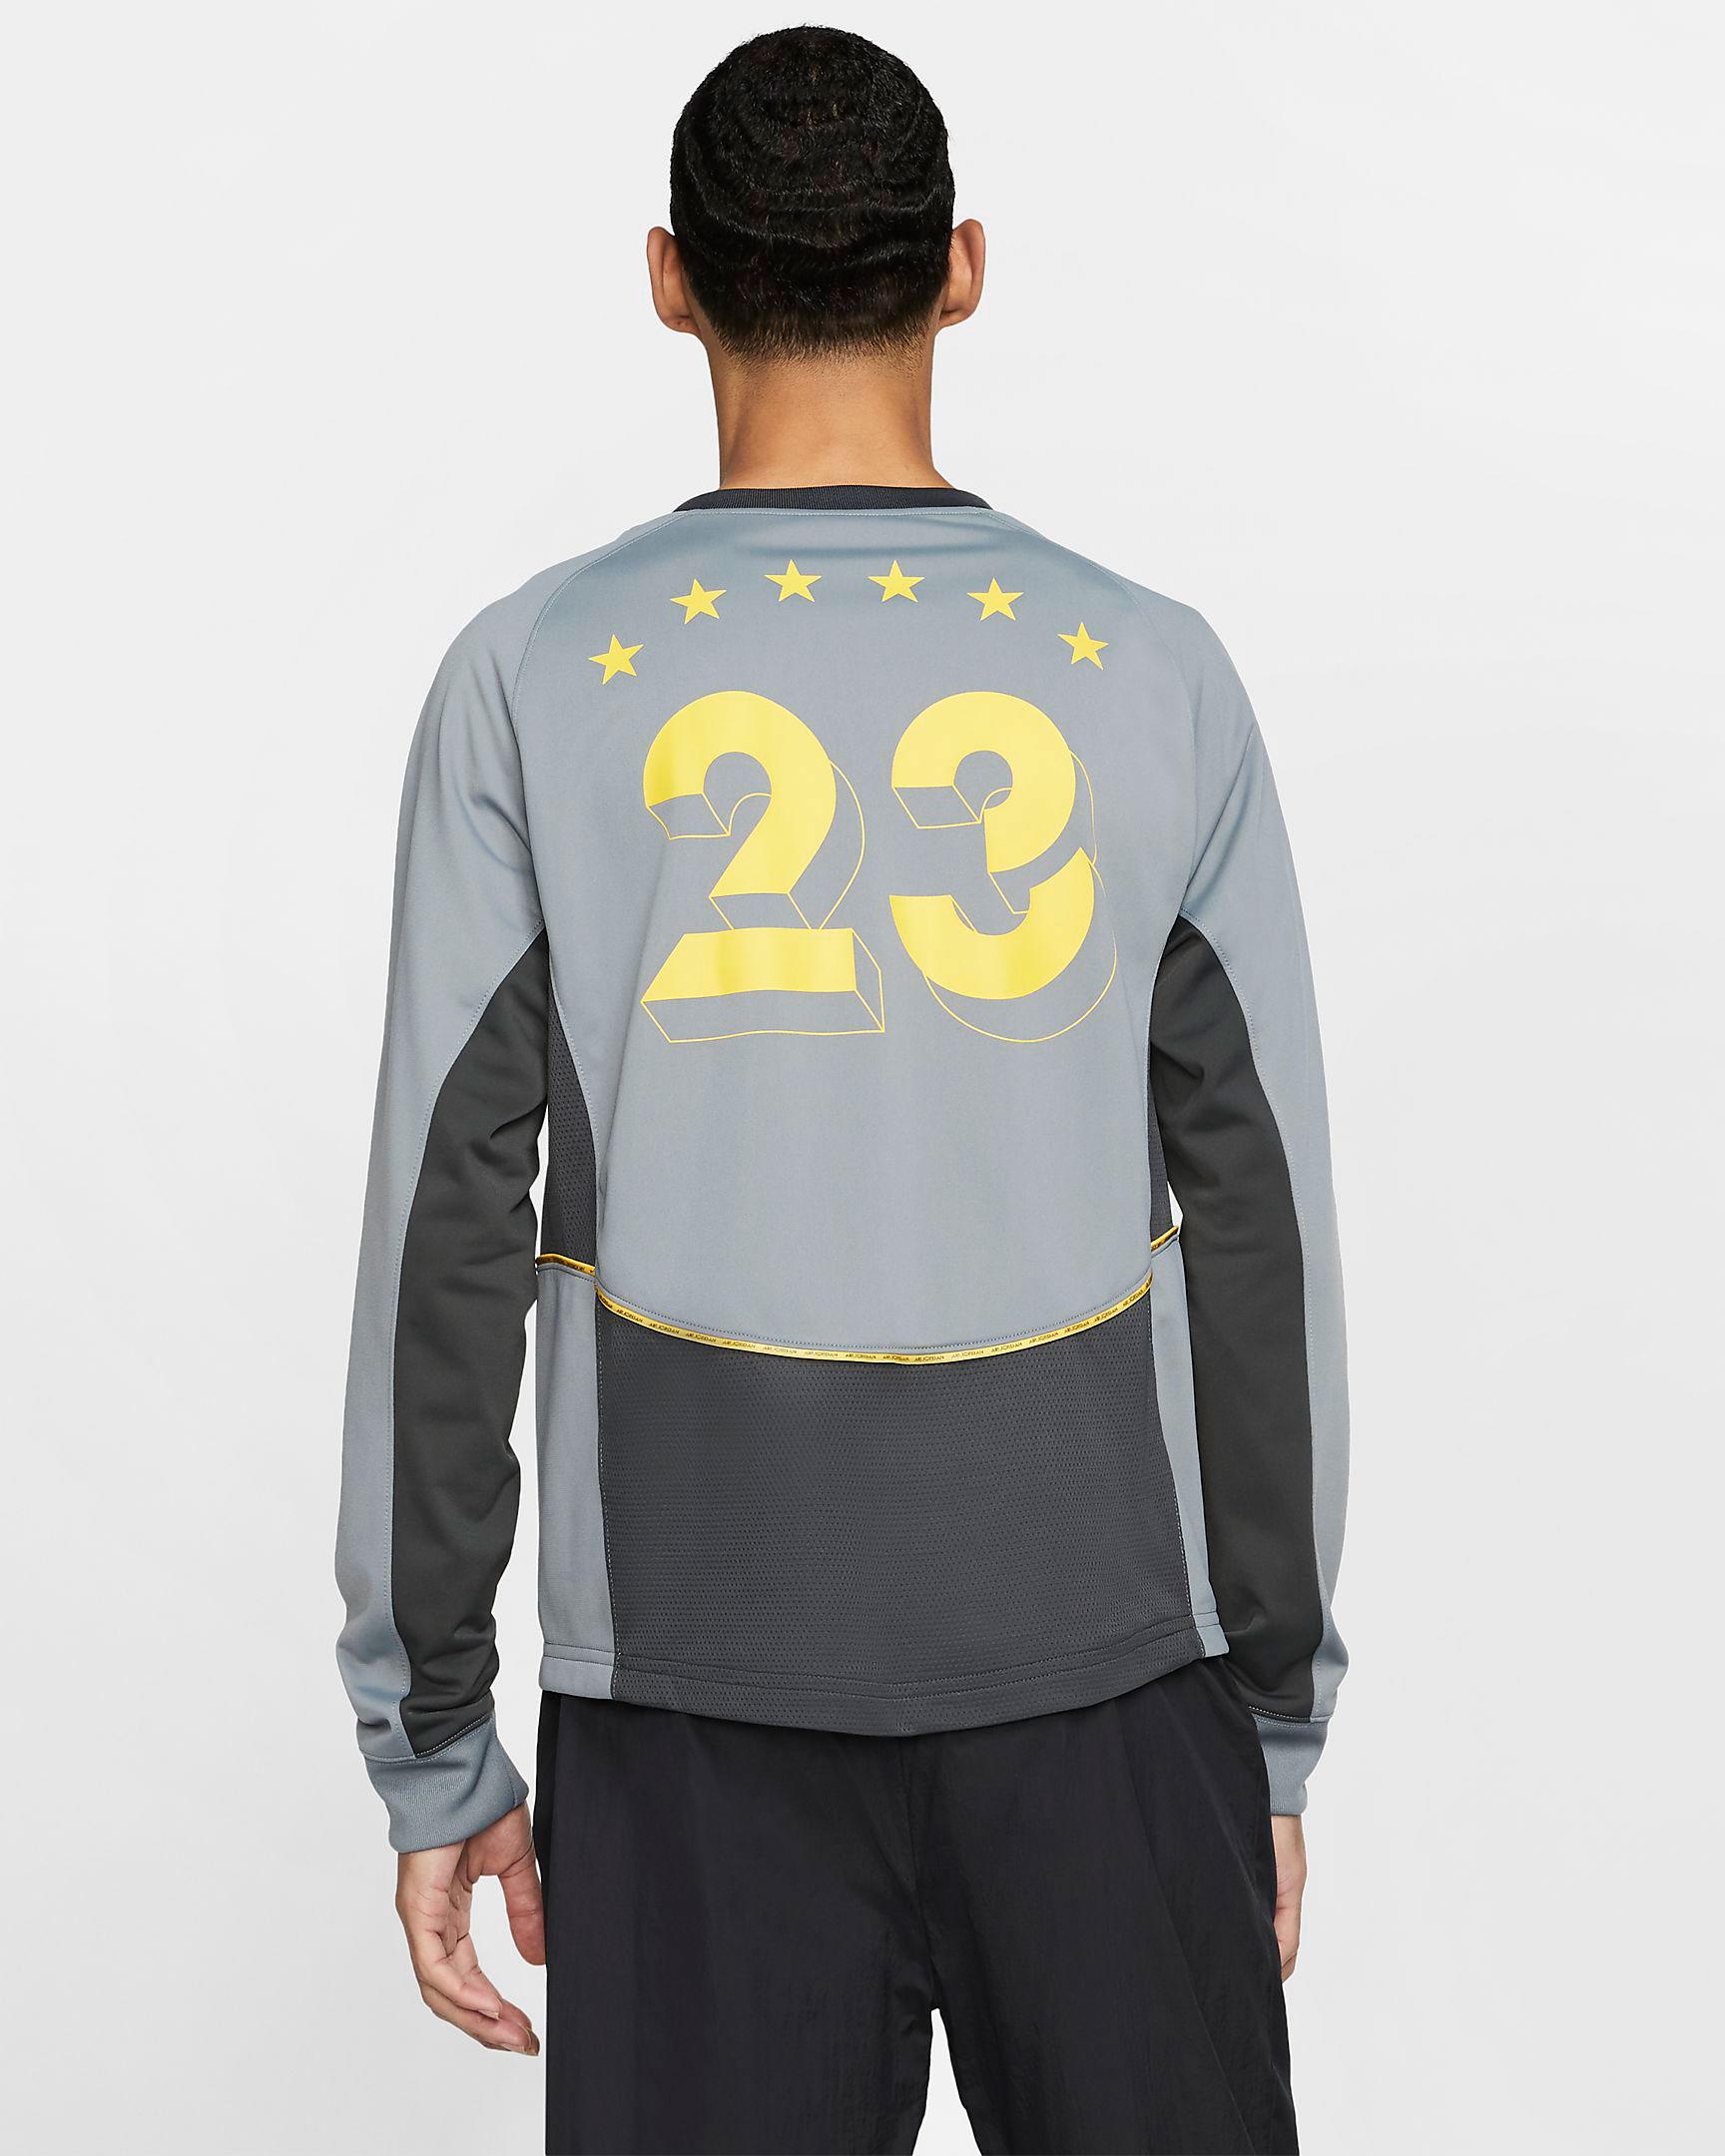 jordan-4-cool-grey-long-sleeve-top-5